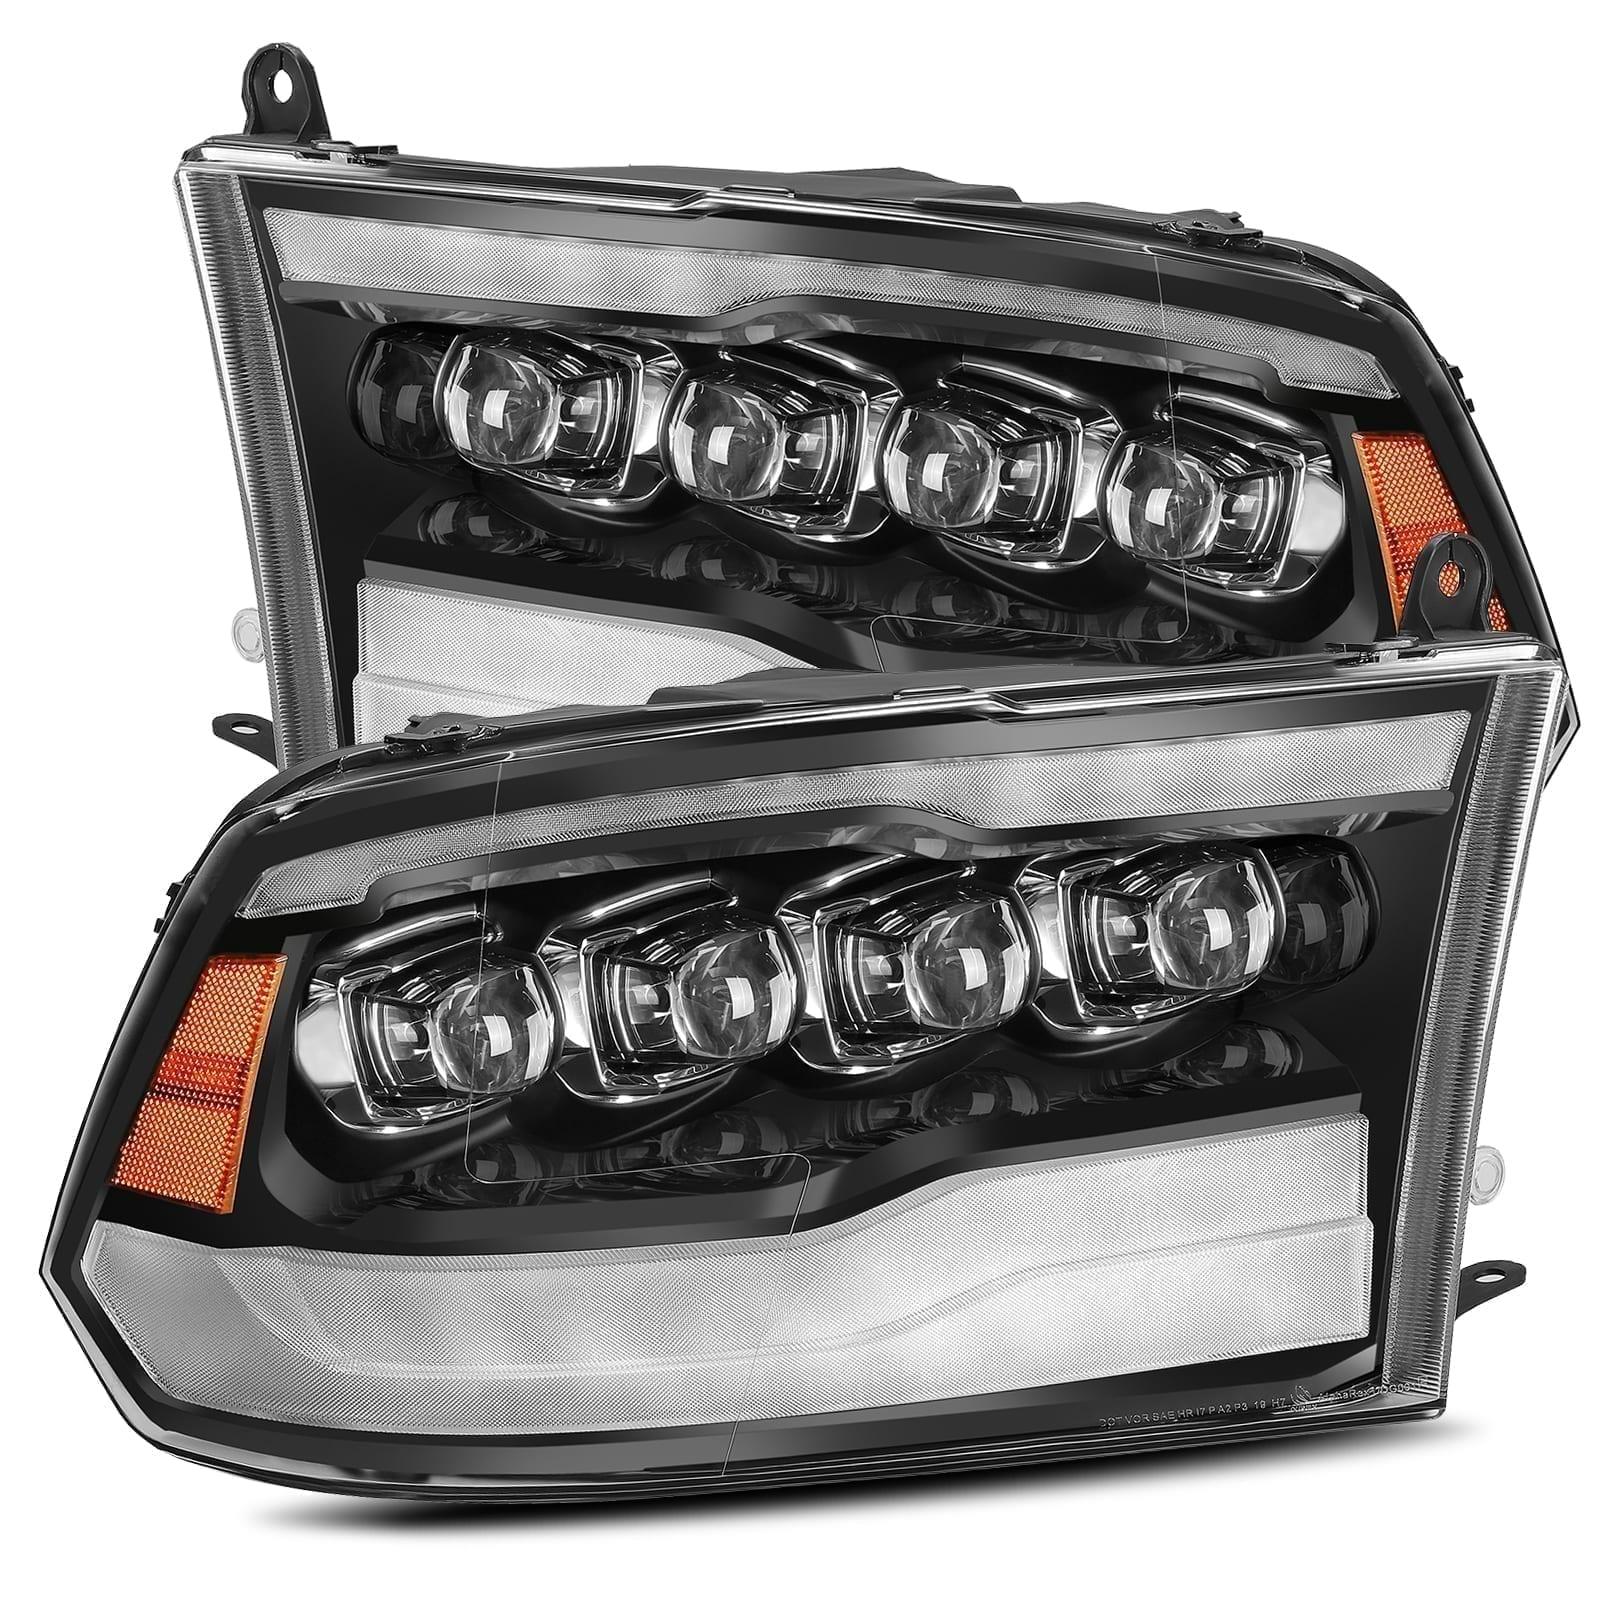 2009 2010 2011 2012 2013 2014 2015 2016 2017 2018 Ram 1500 2500 3500 NOVA Series Full LED Projector Headlights Jet Black